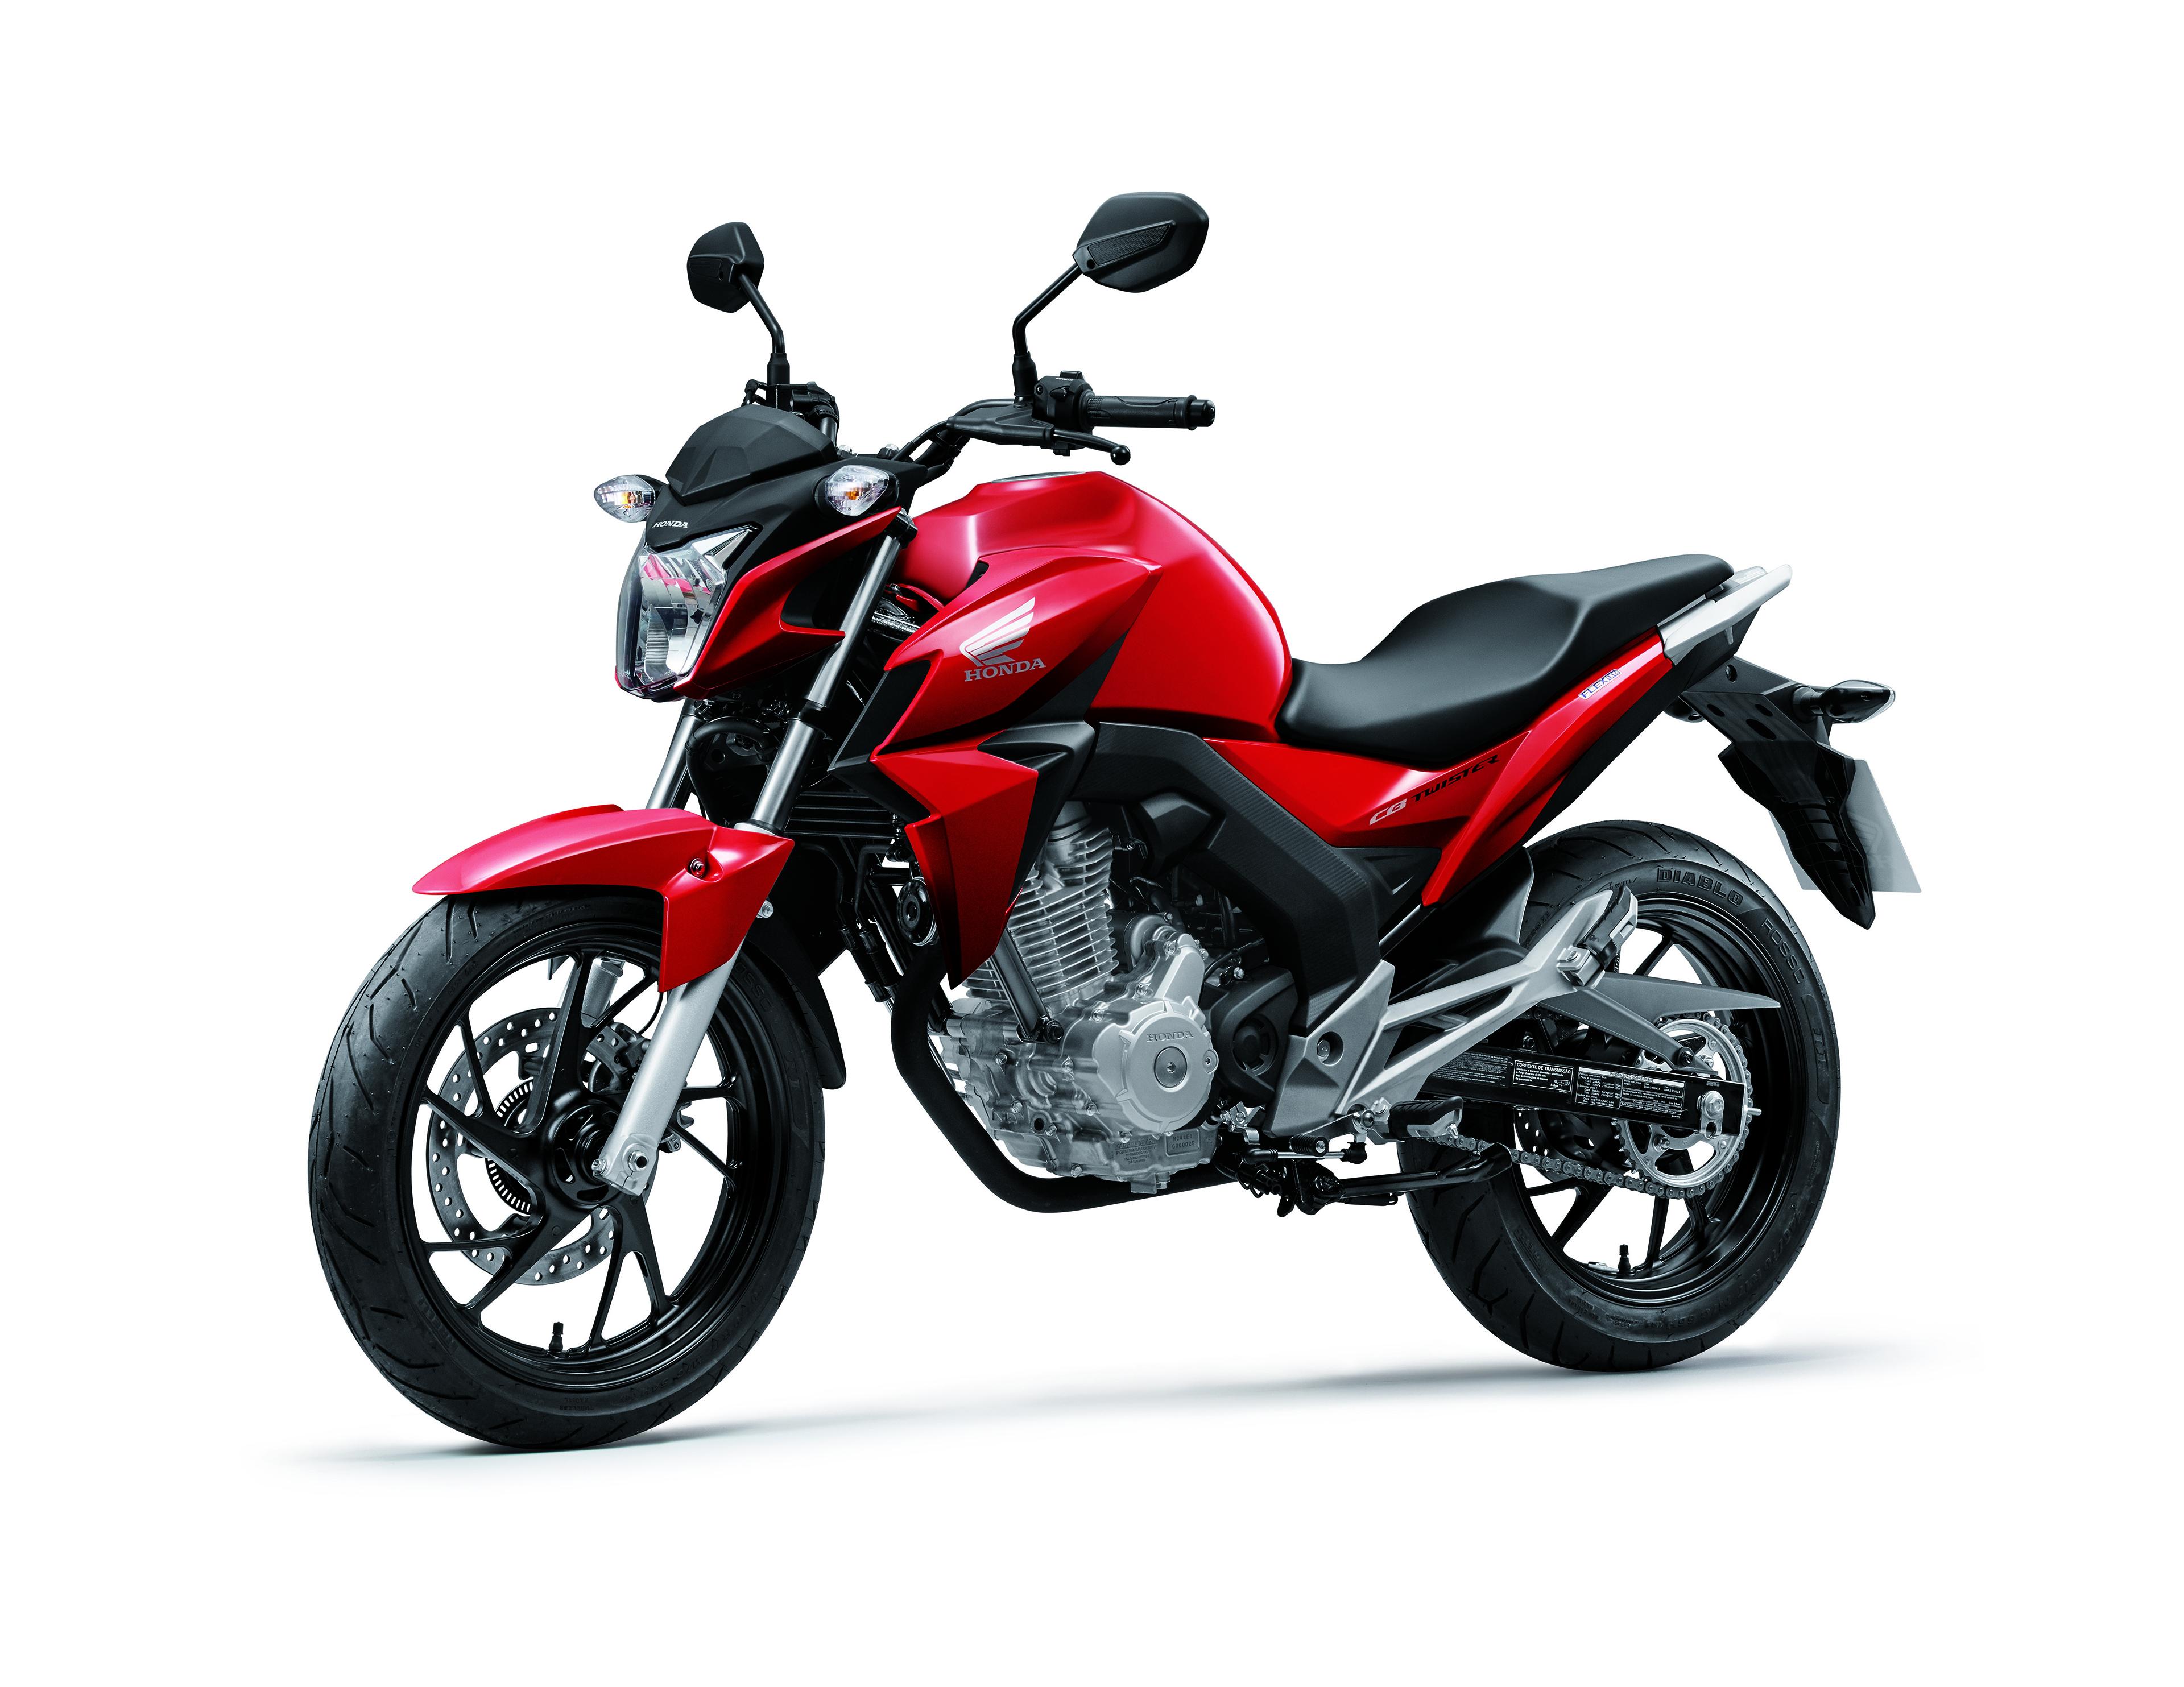 Honda twister 2020